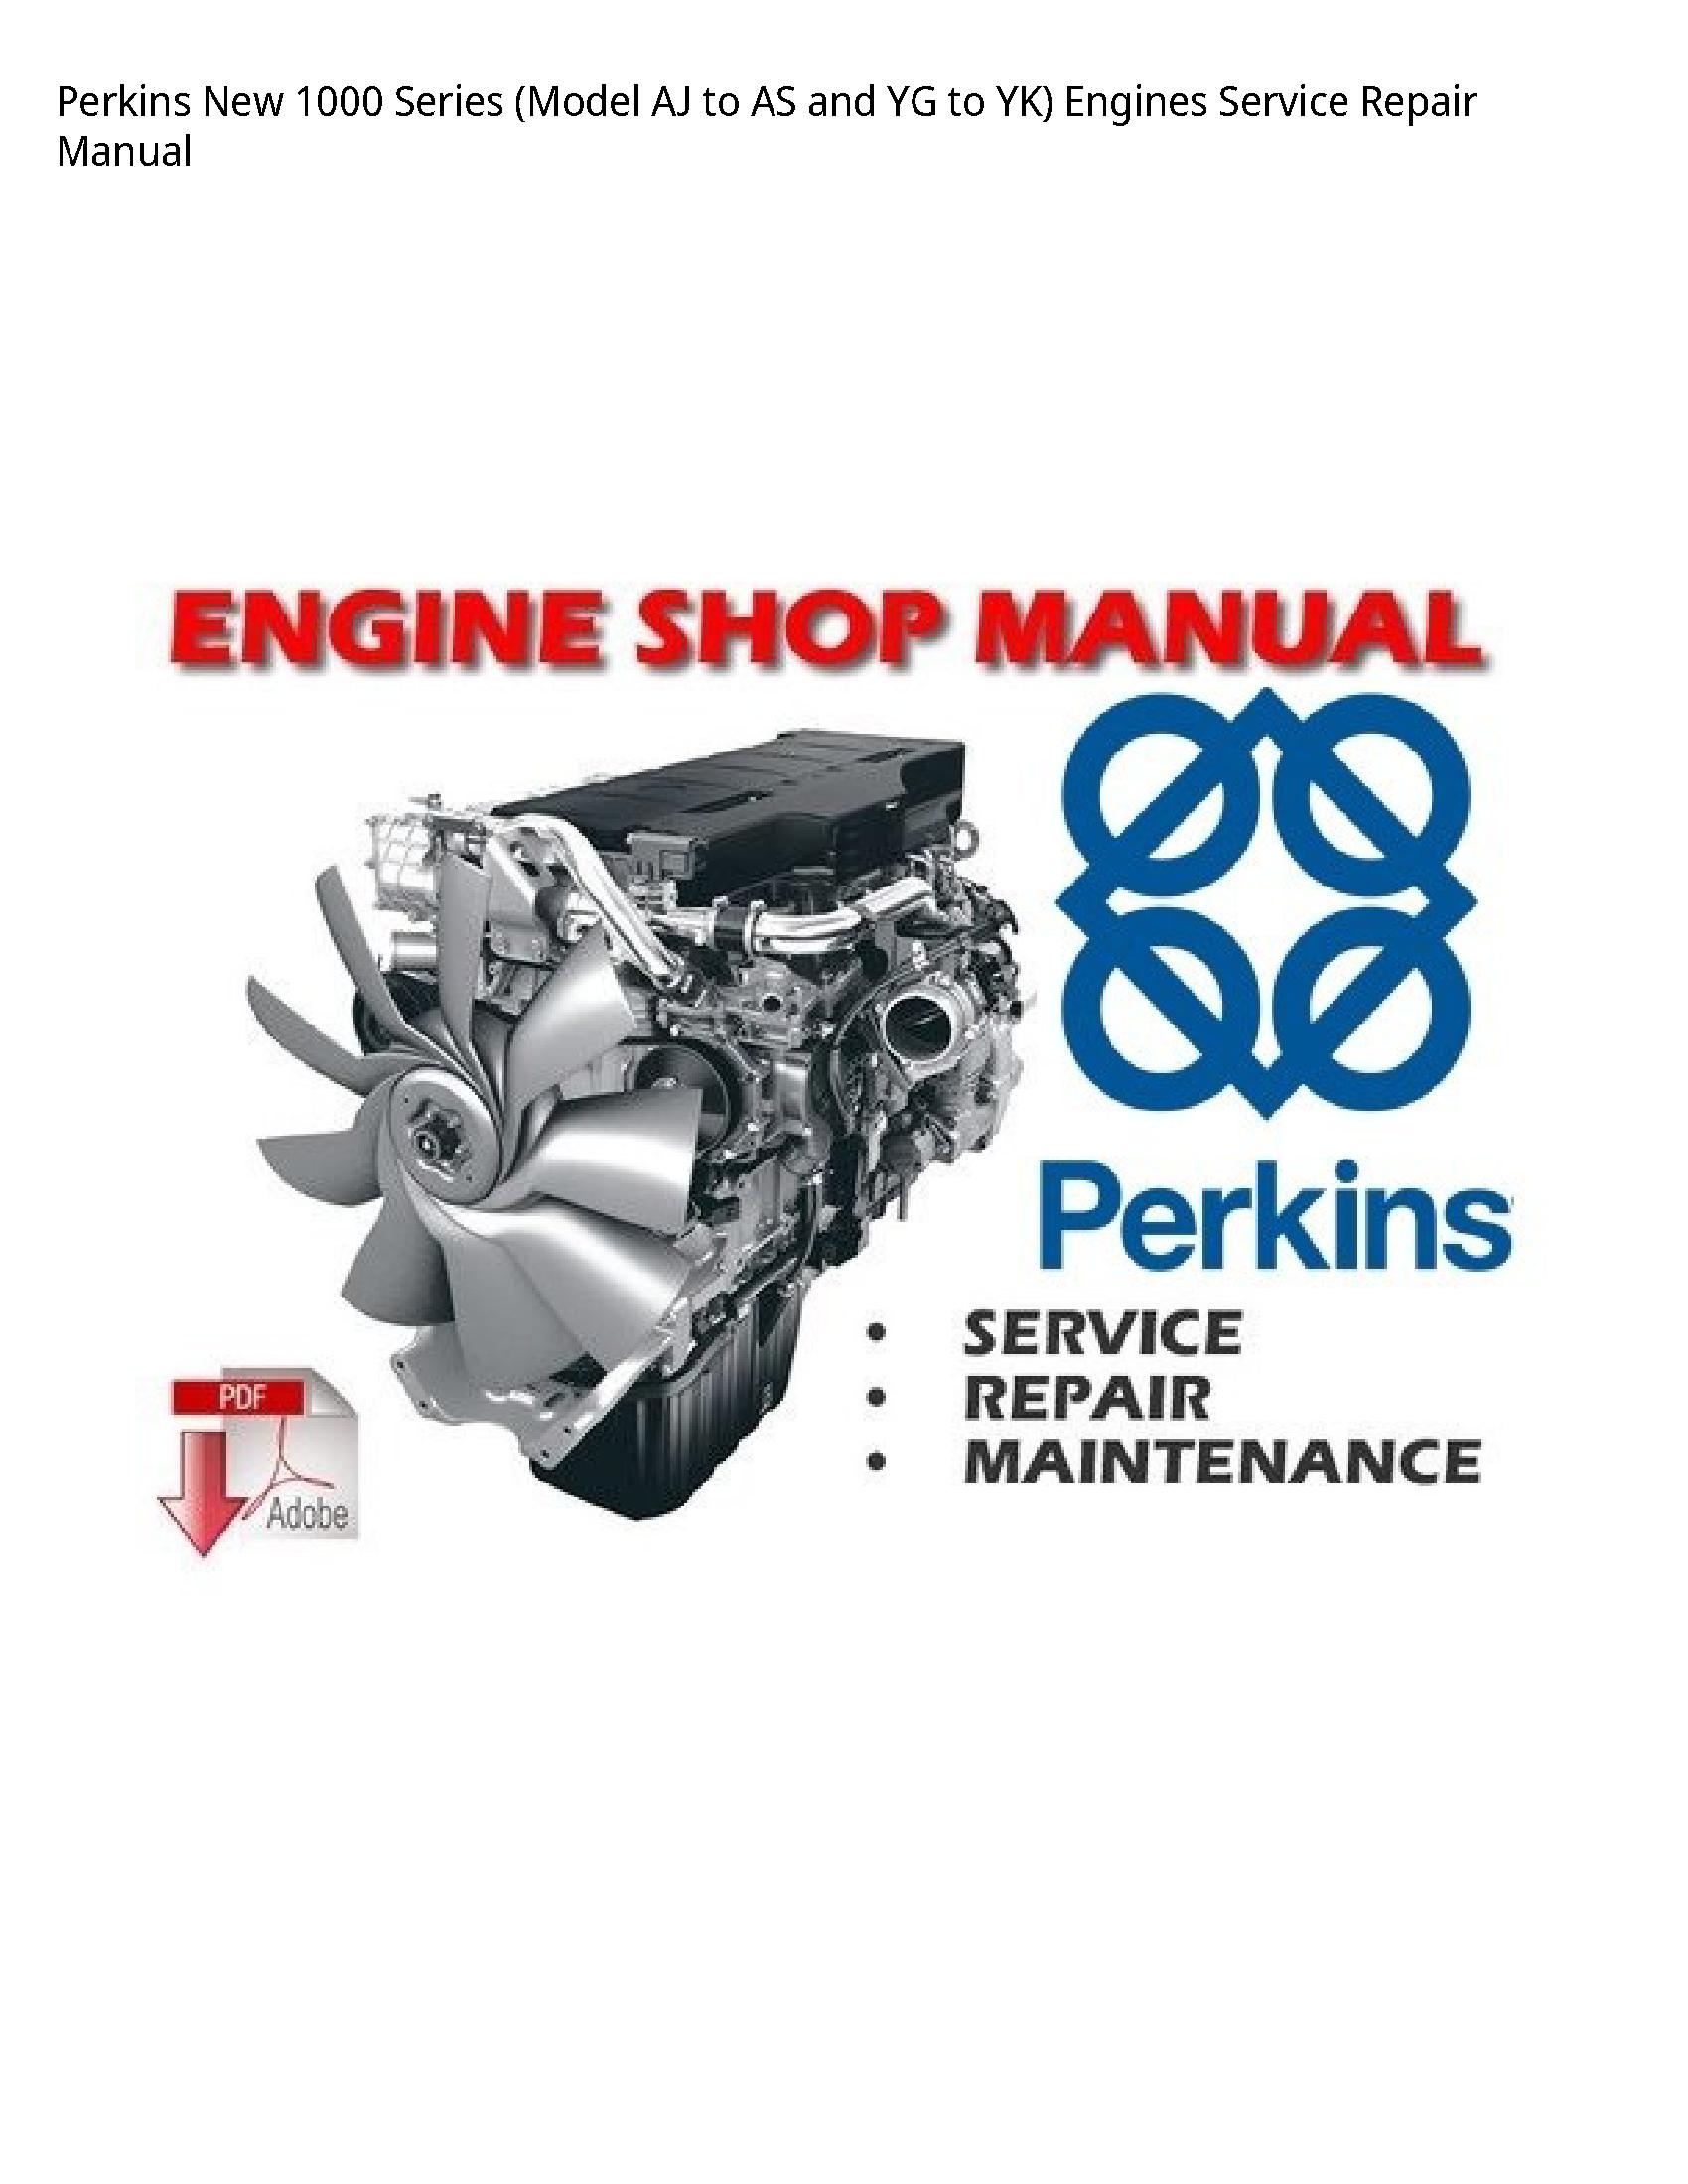 Perkins 1000 New Series (Model AJ to AS  YG to YK) Engines manual